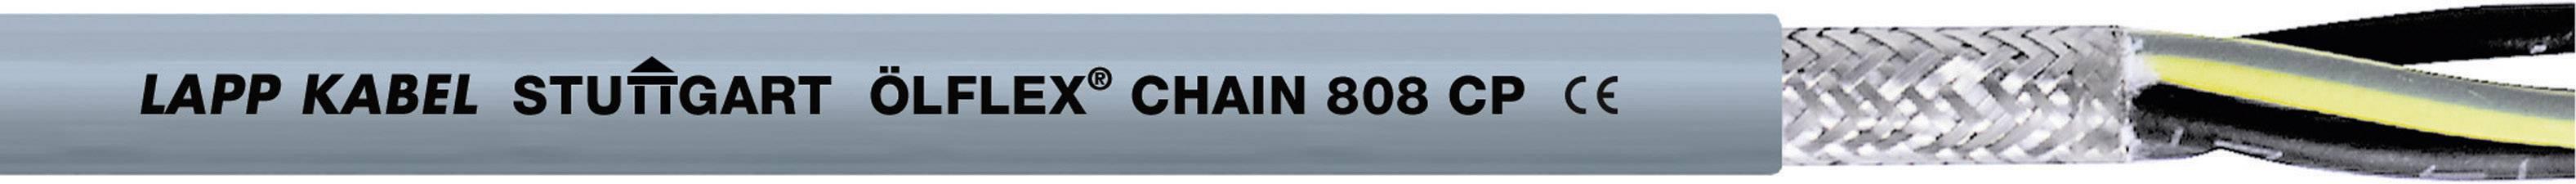 Žíla kabelu LappKabel ÖLFLEX CHAIN 808 CP 3G0,5 (1027752), 3x 0,5 mm², polyurethan, Ø 6,1 mm, stíněný, 1 m, še